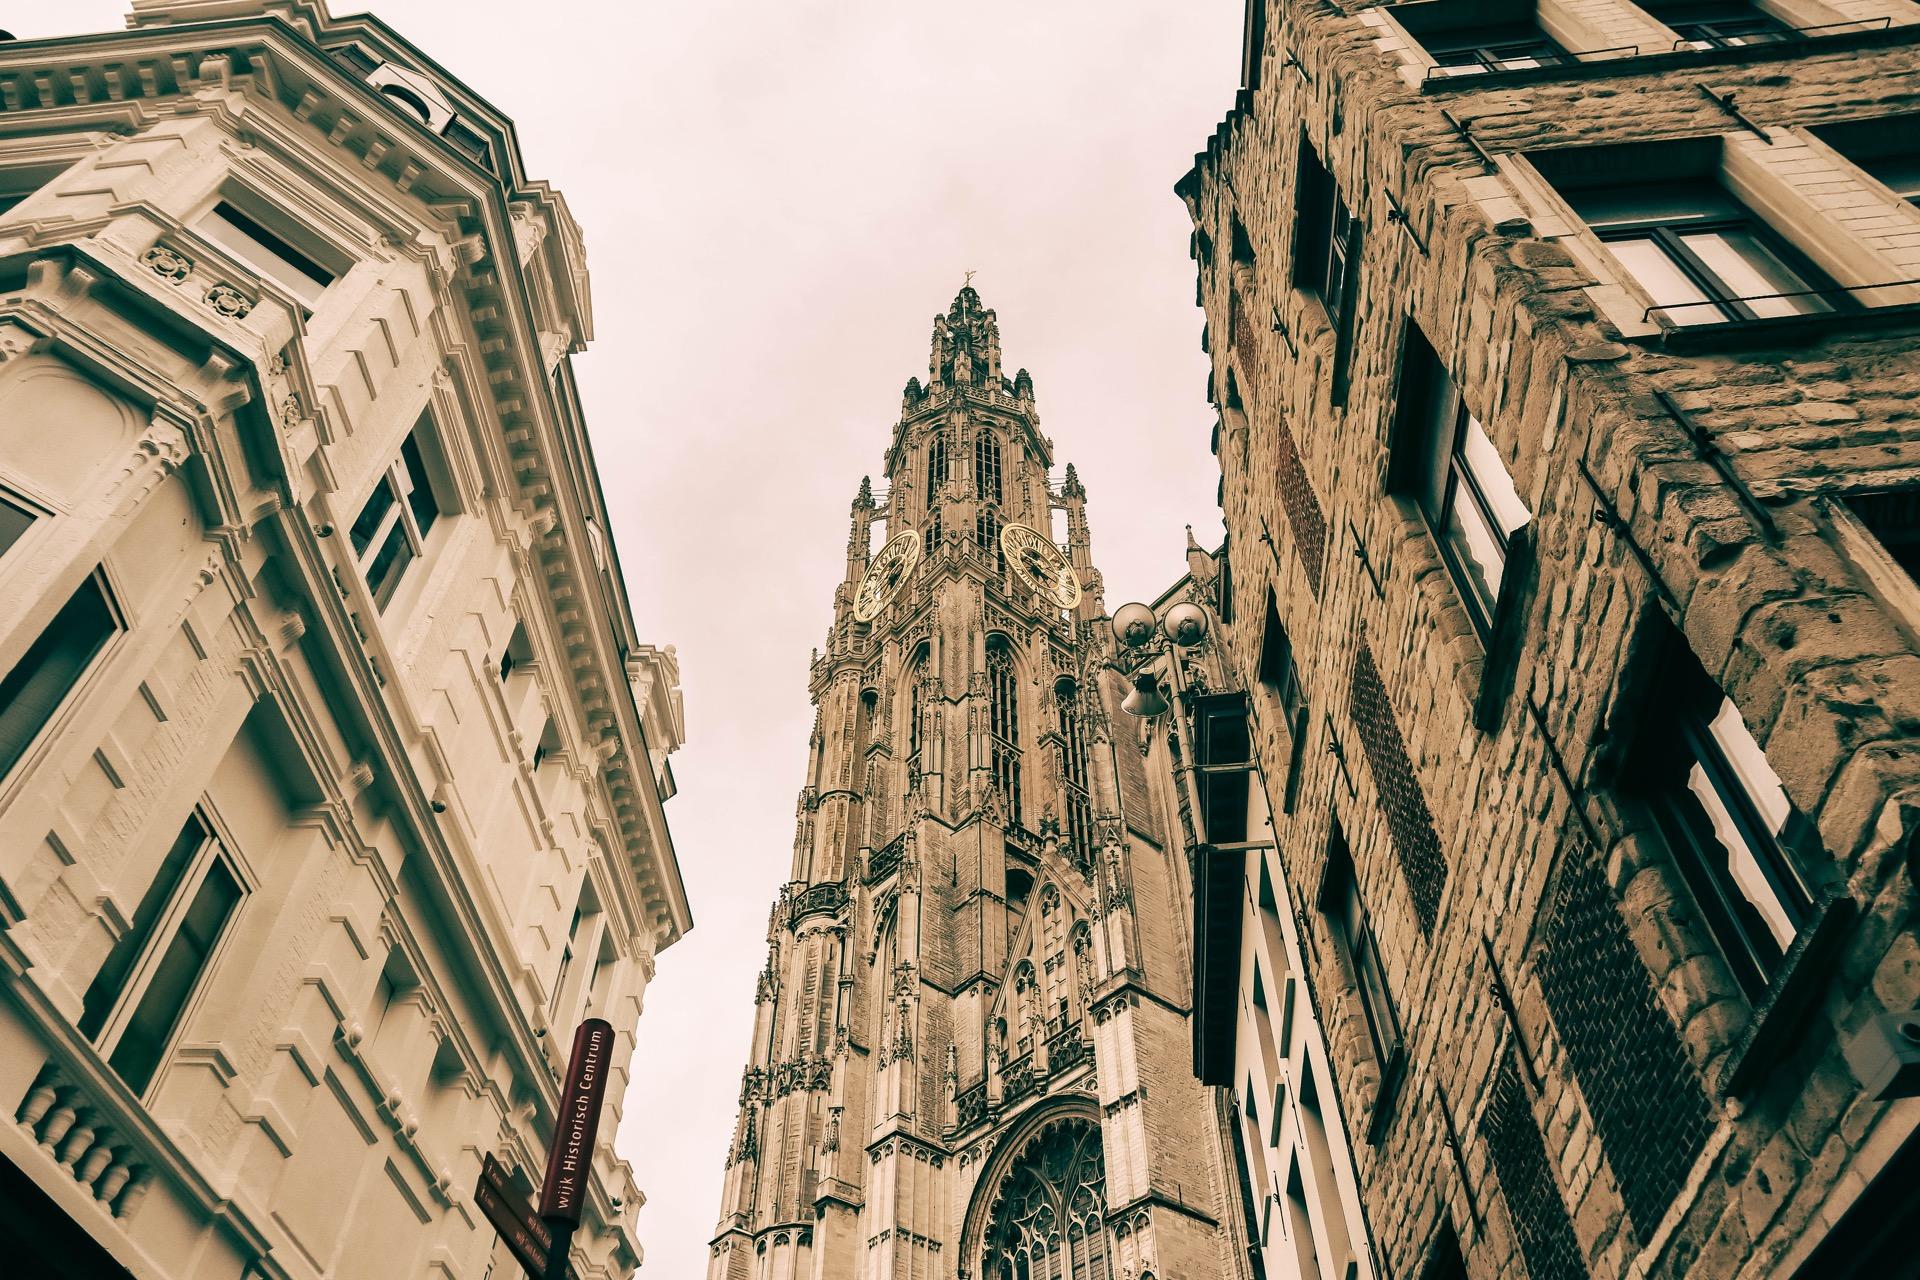 View of Onze-Lieve-Vrouwekathedraal Antwerp from the street